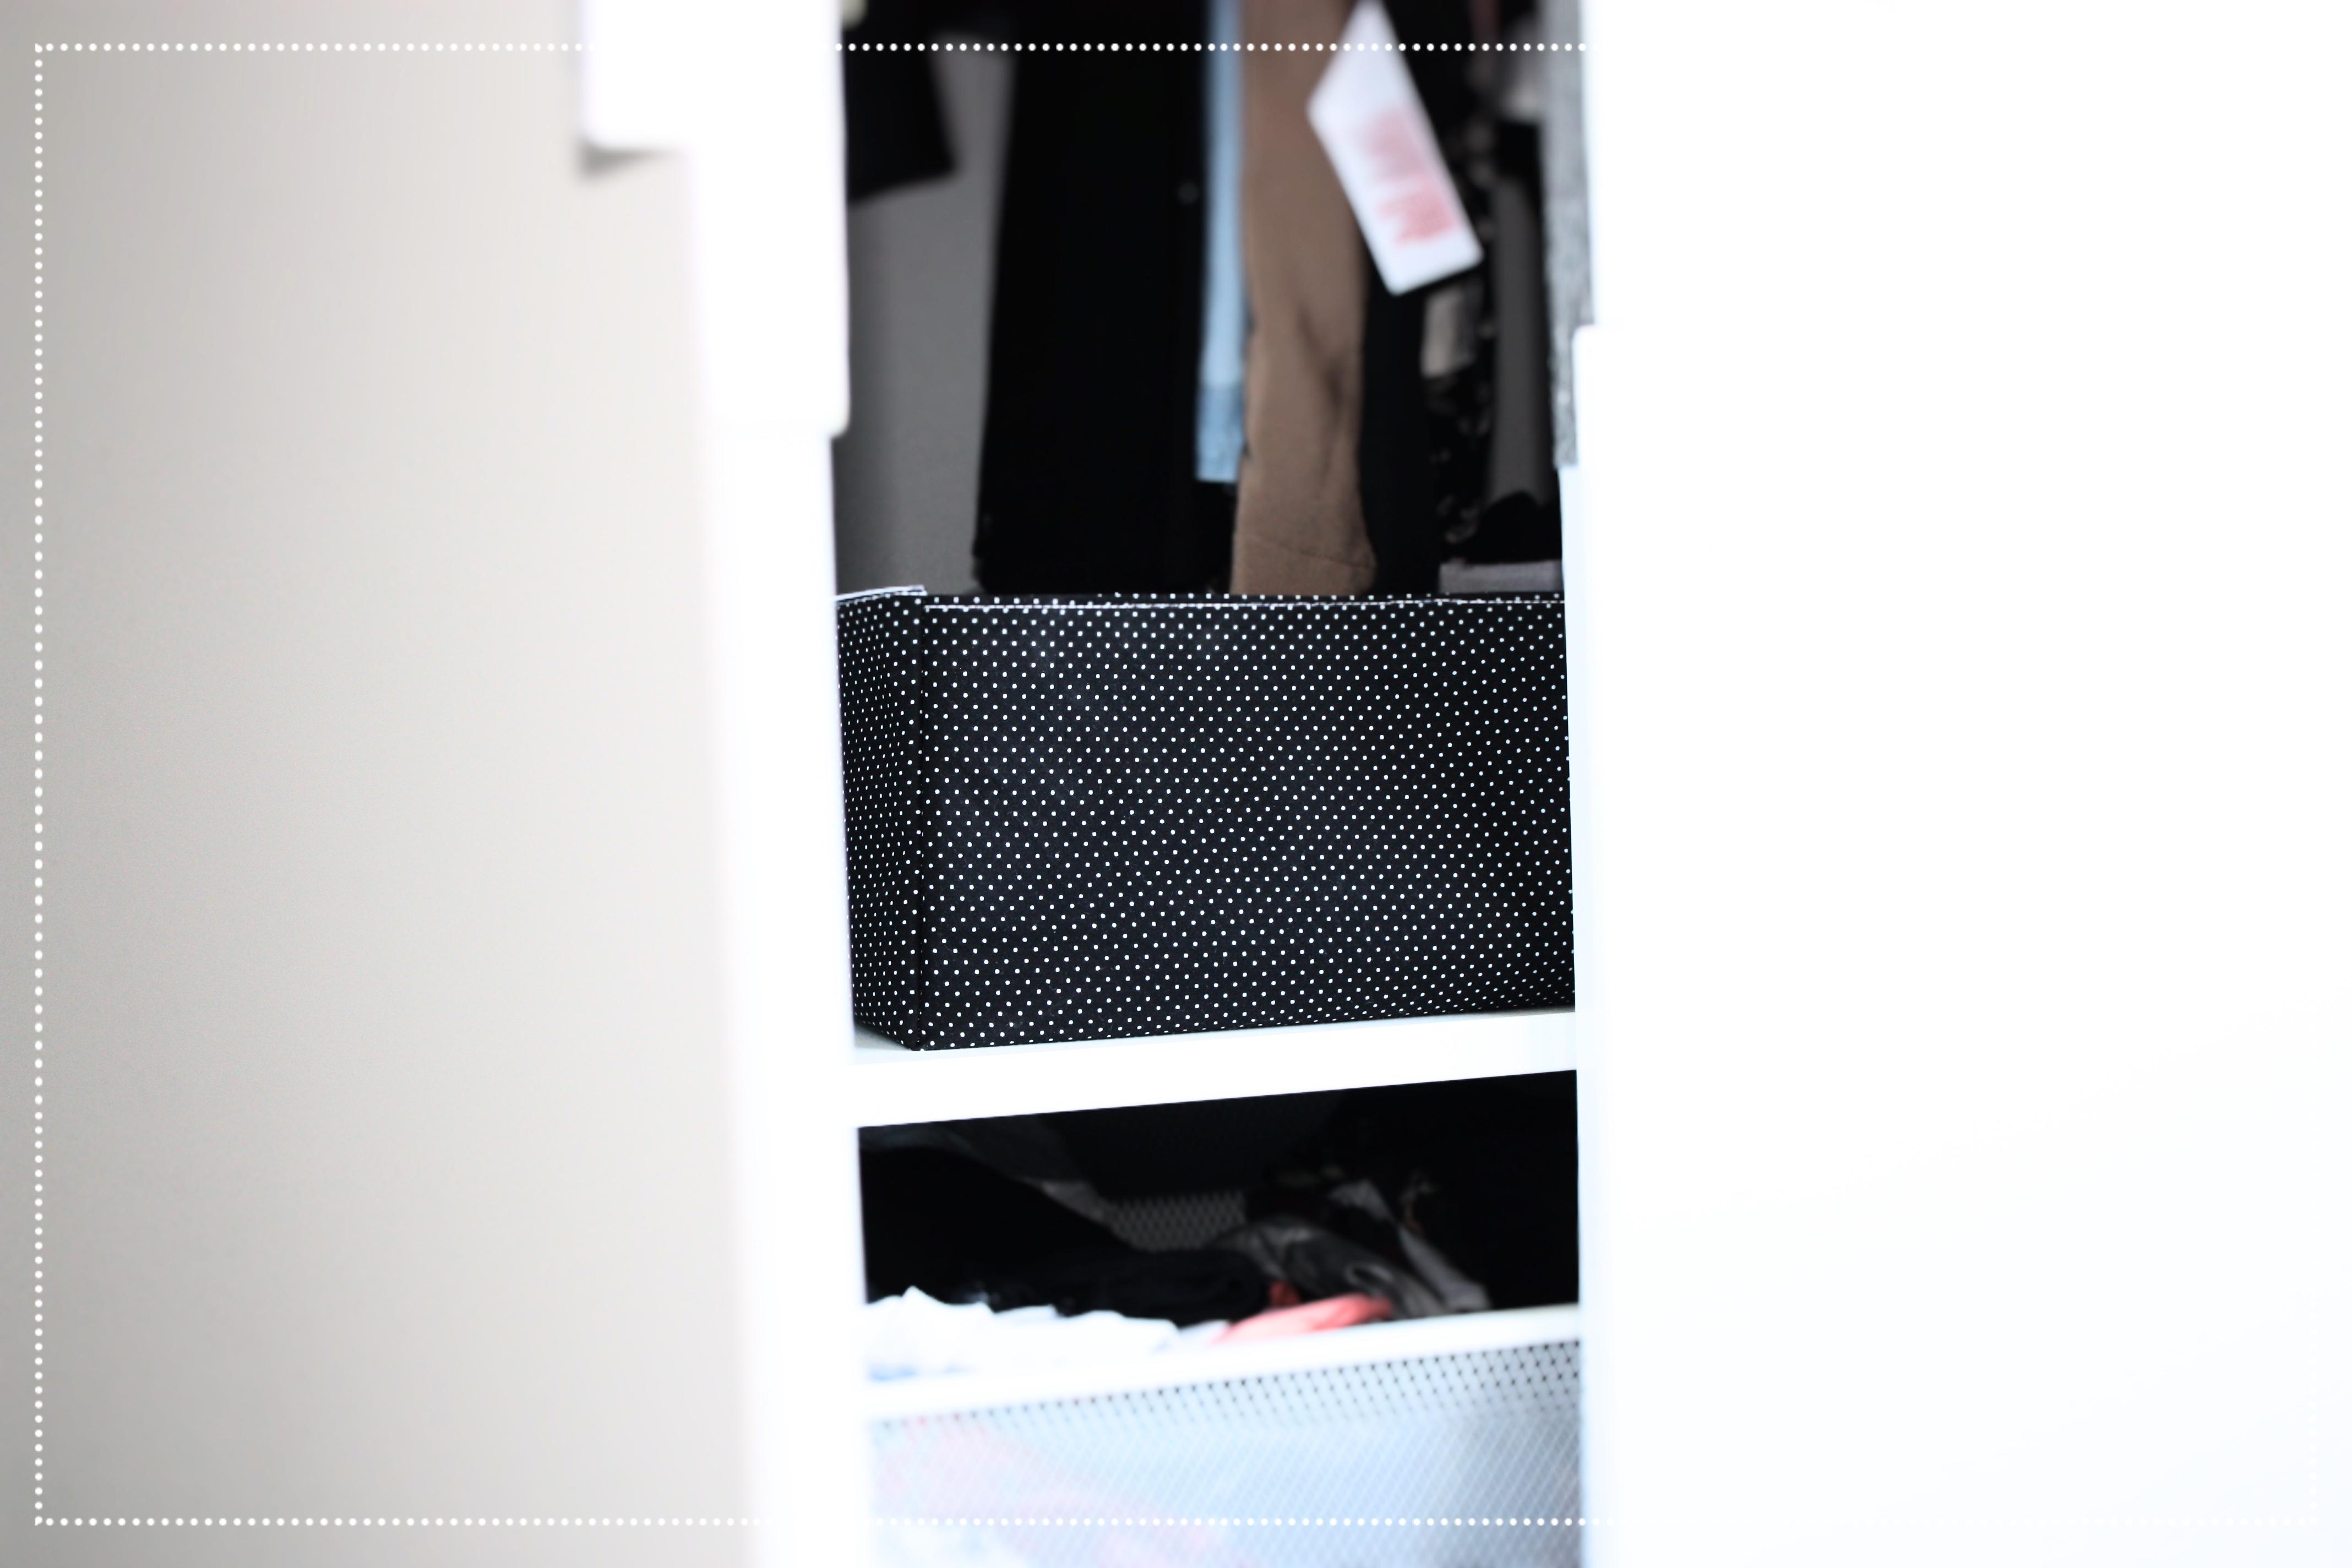 comment rigidifier son tissu tuto panier de rangement en tissu thermocollant tiss rigide. Black Bedroom Furniture Sets. Home Design Ideas